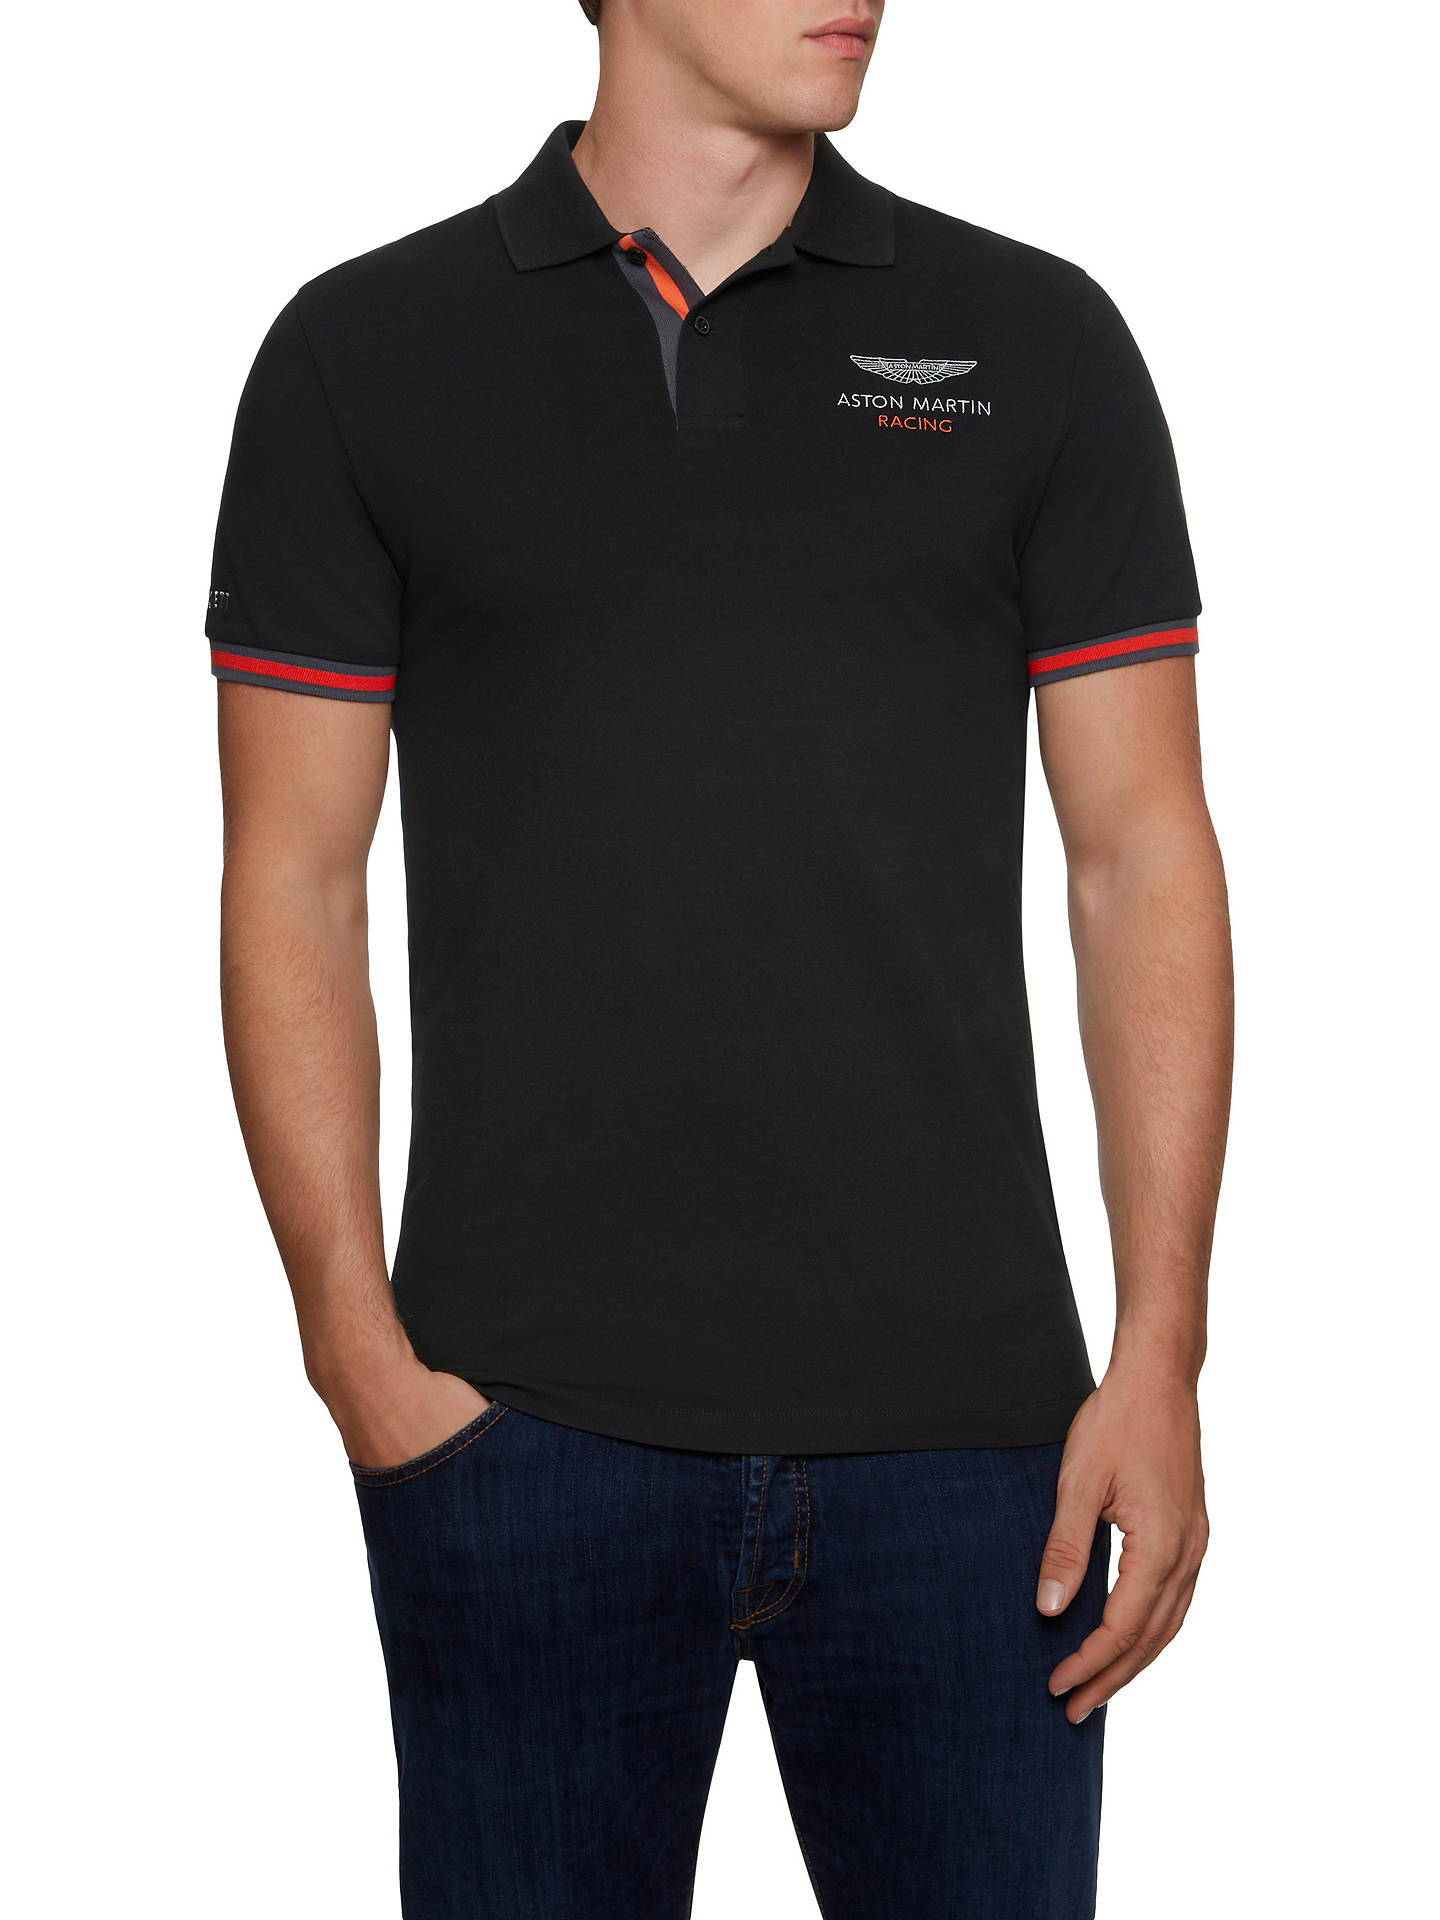 Hackett London Aston Martin Racing Polo Shirt Black At John Lewis - Aston martin shirt